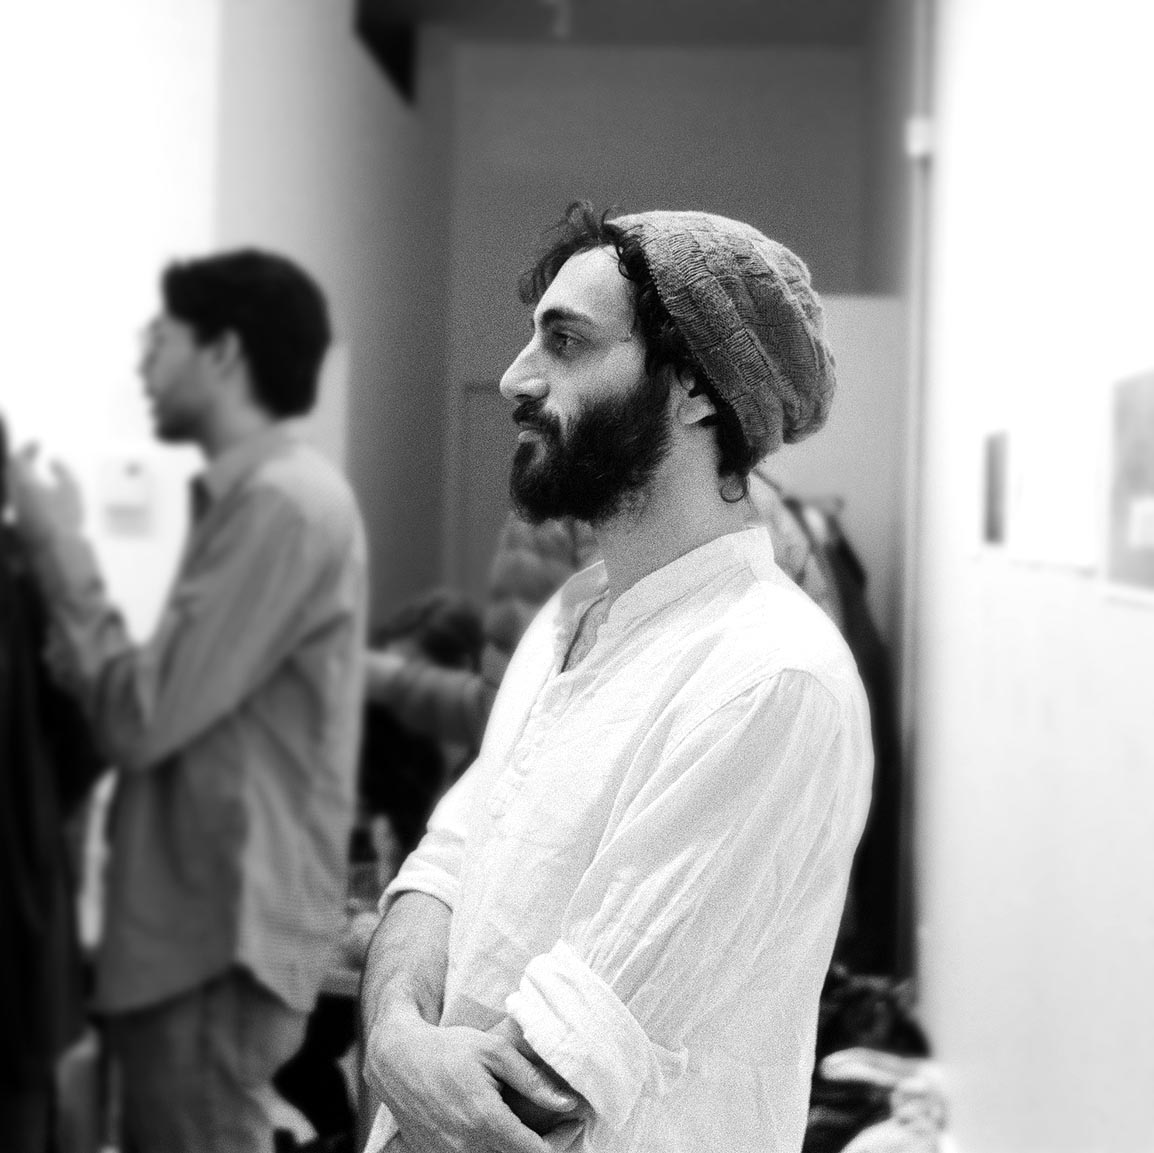 Amit Sadik - עמית צדיק